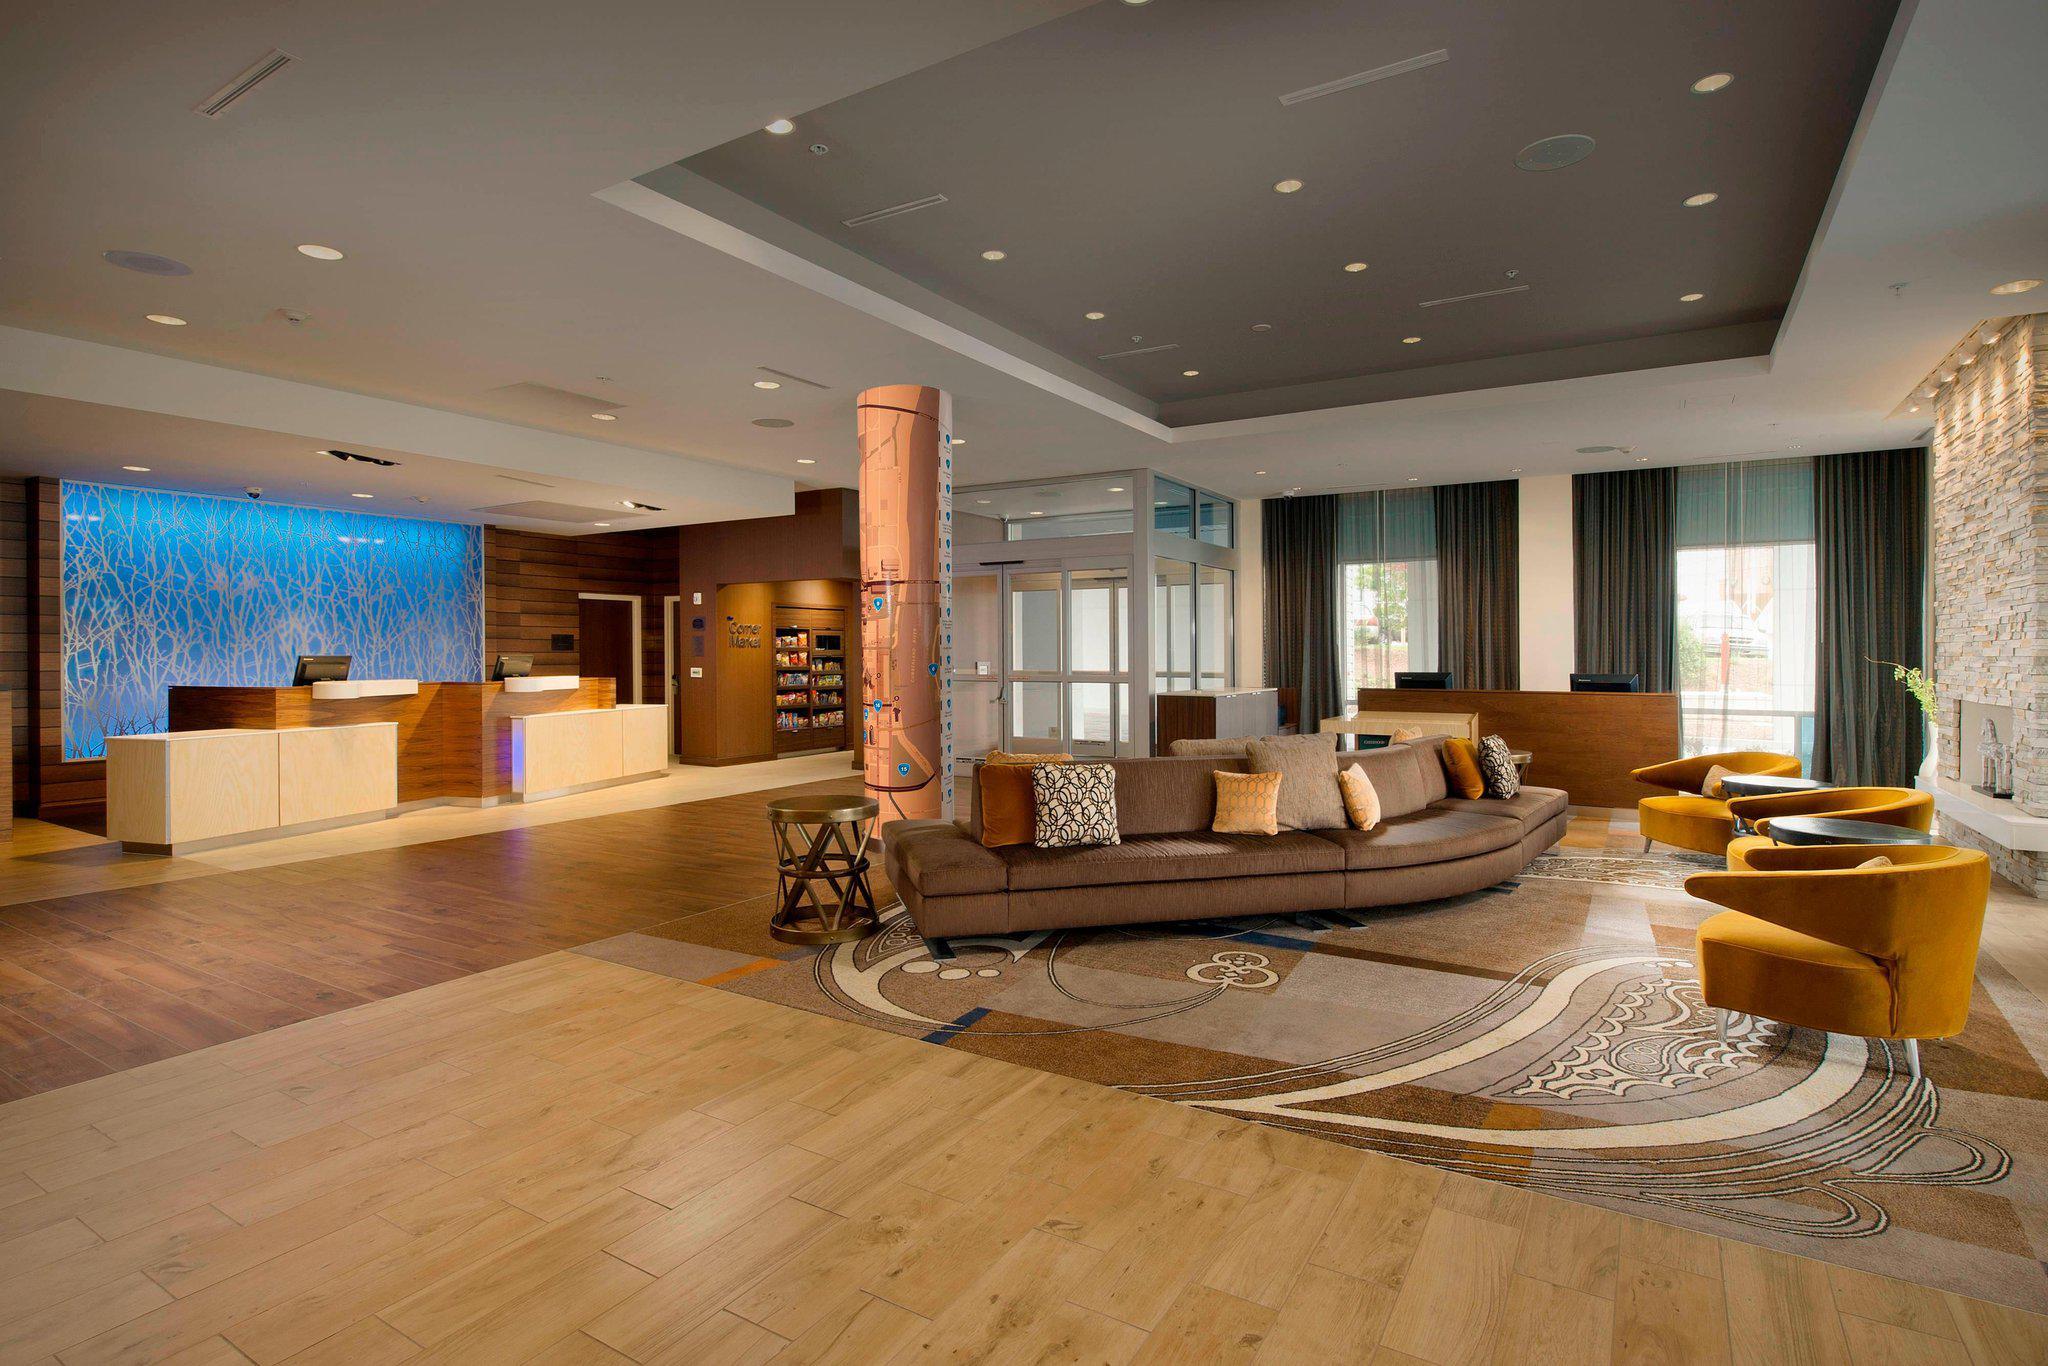 Fairfield Inn & Suites by Marriott Nashville Downtown/The Gulch